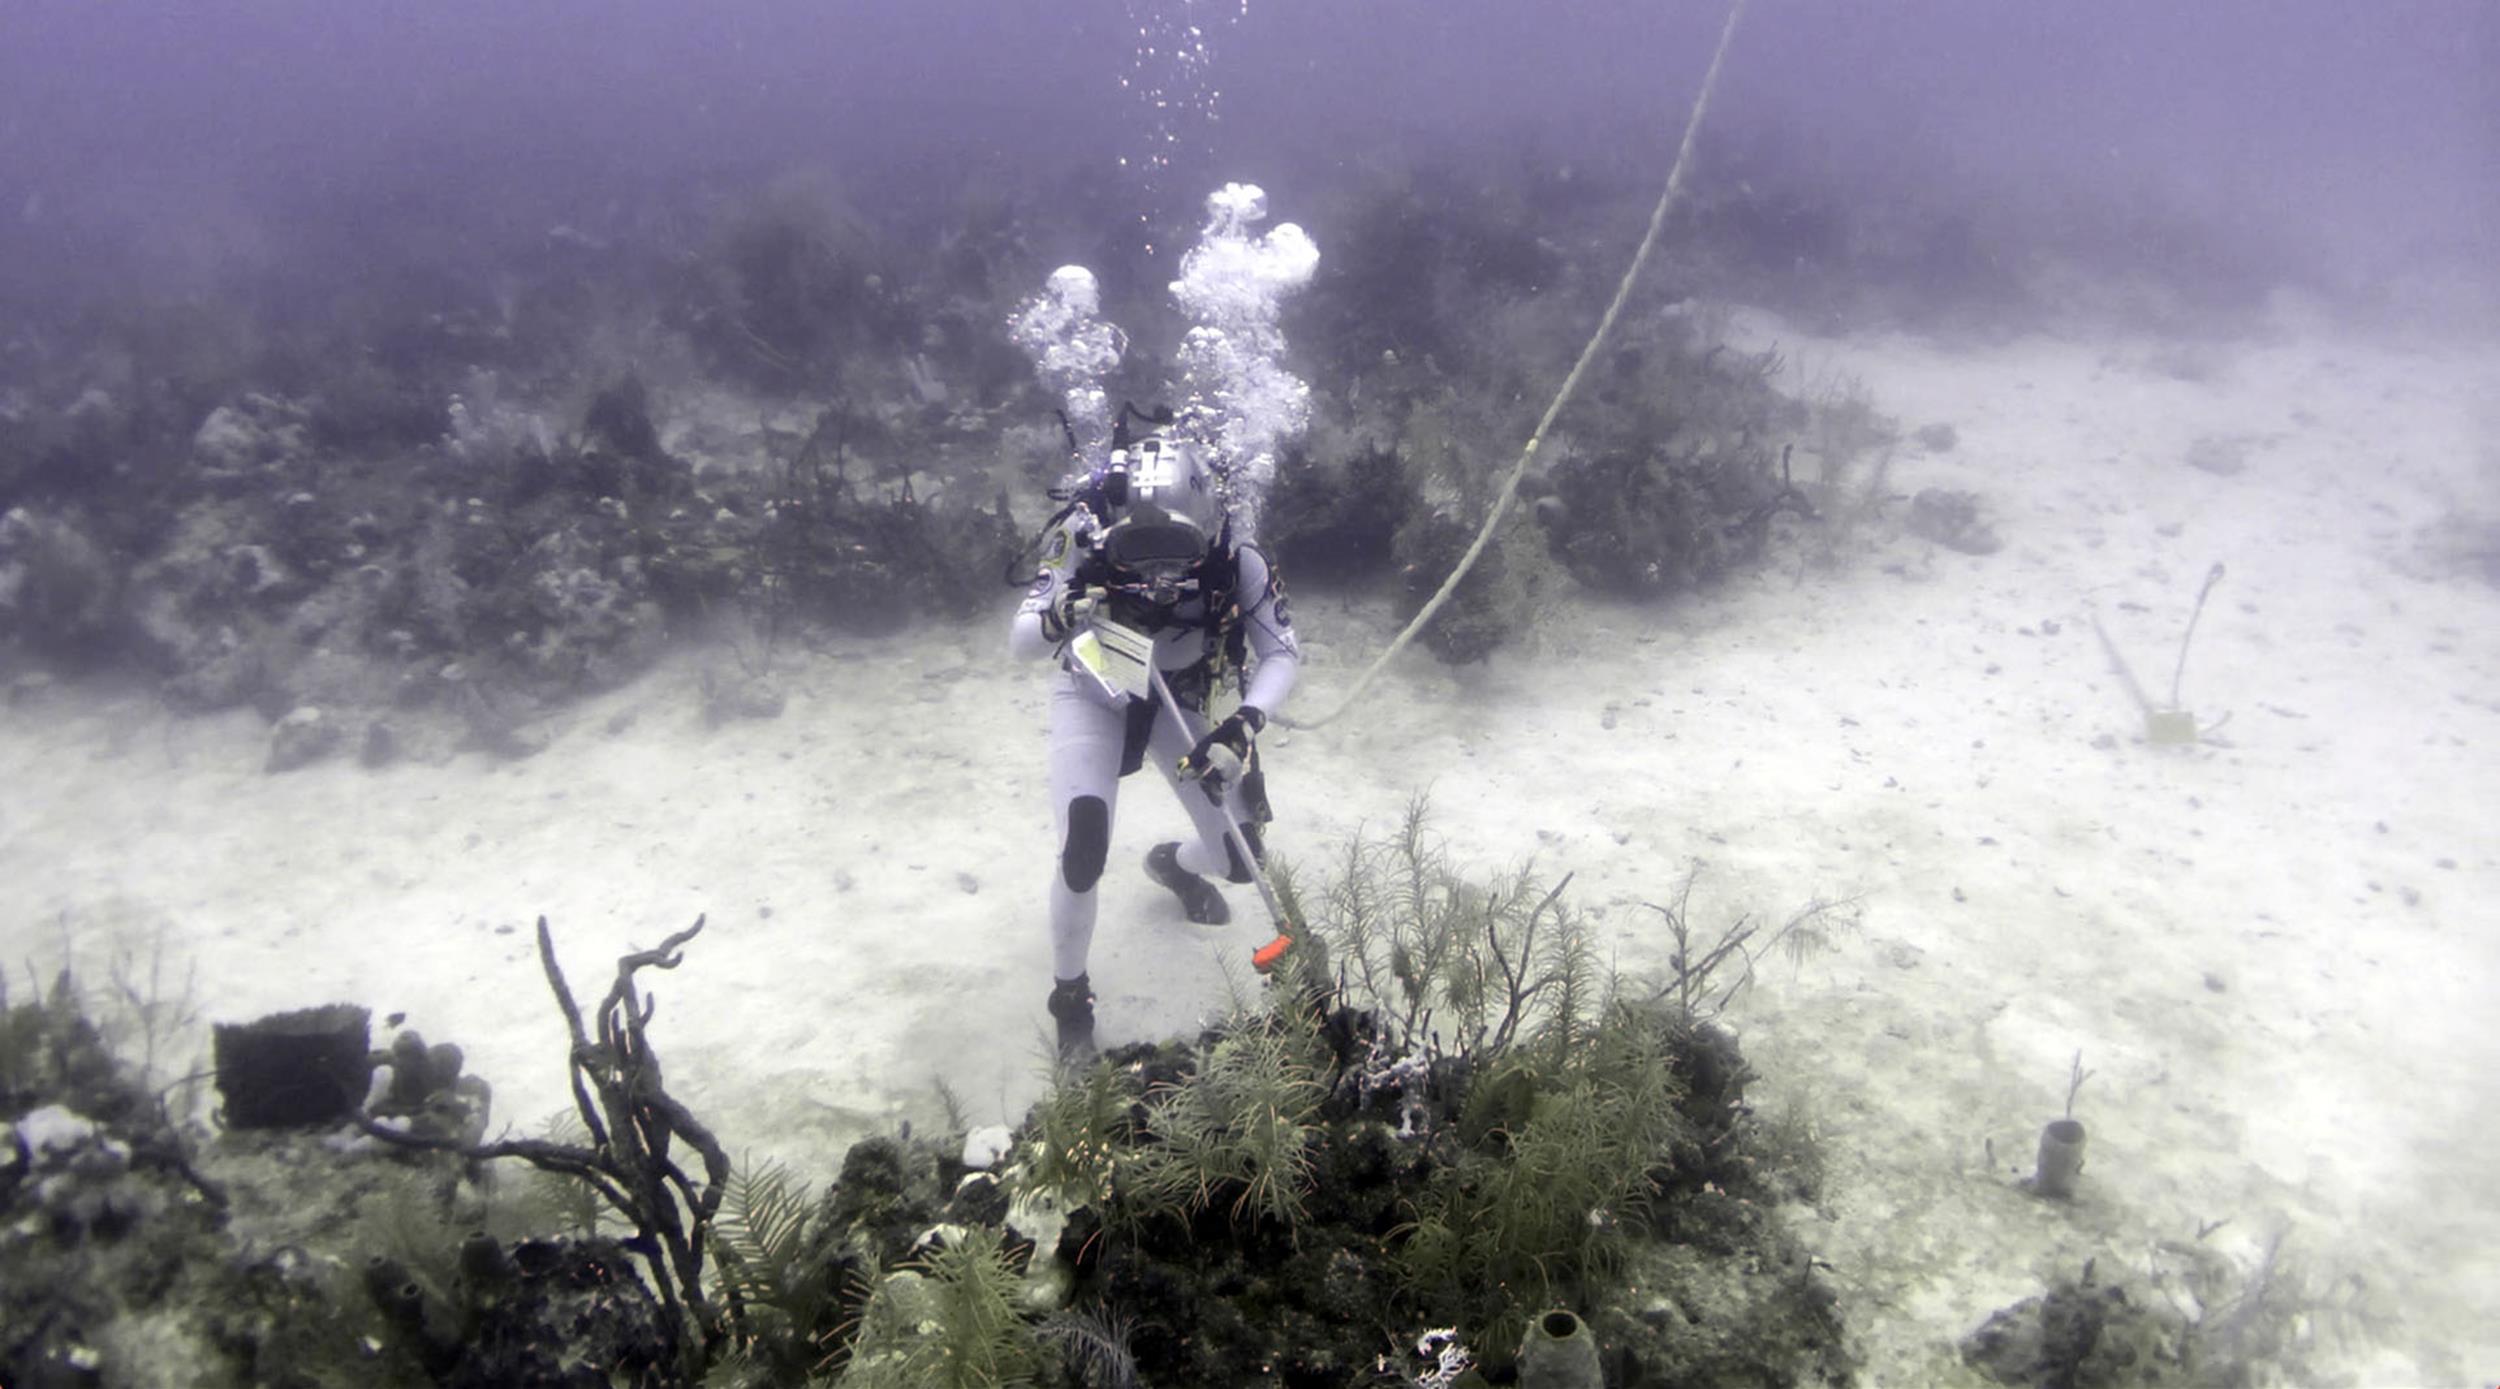 Hold Your Breath: 'Aquastronauts' Go Underwater to Train ...